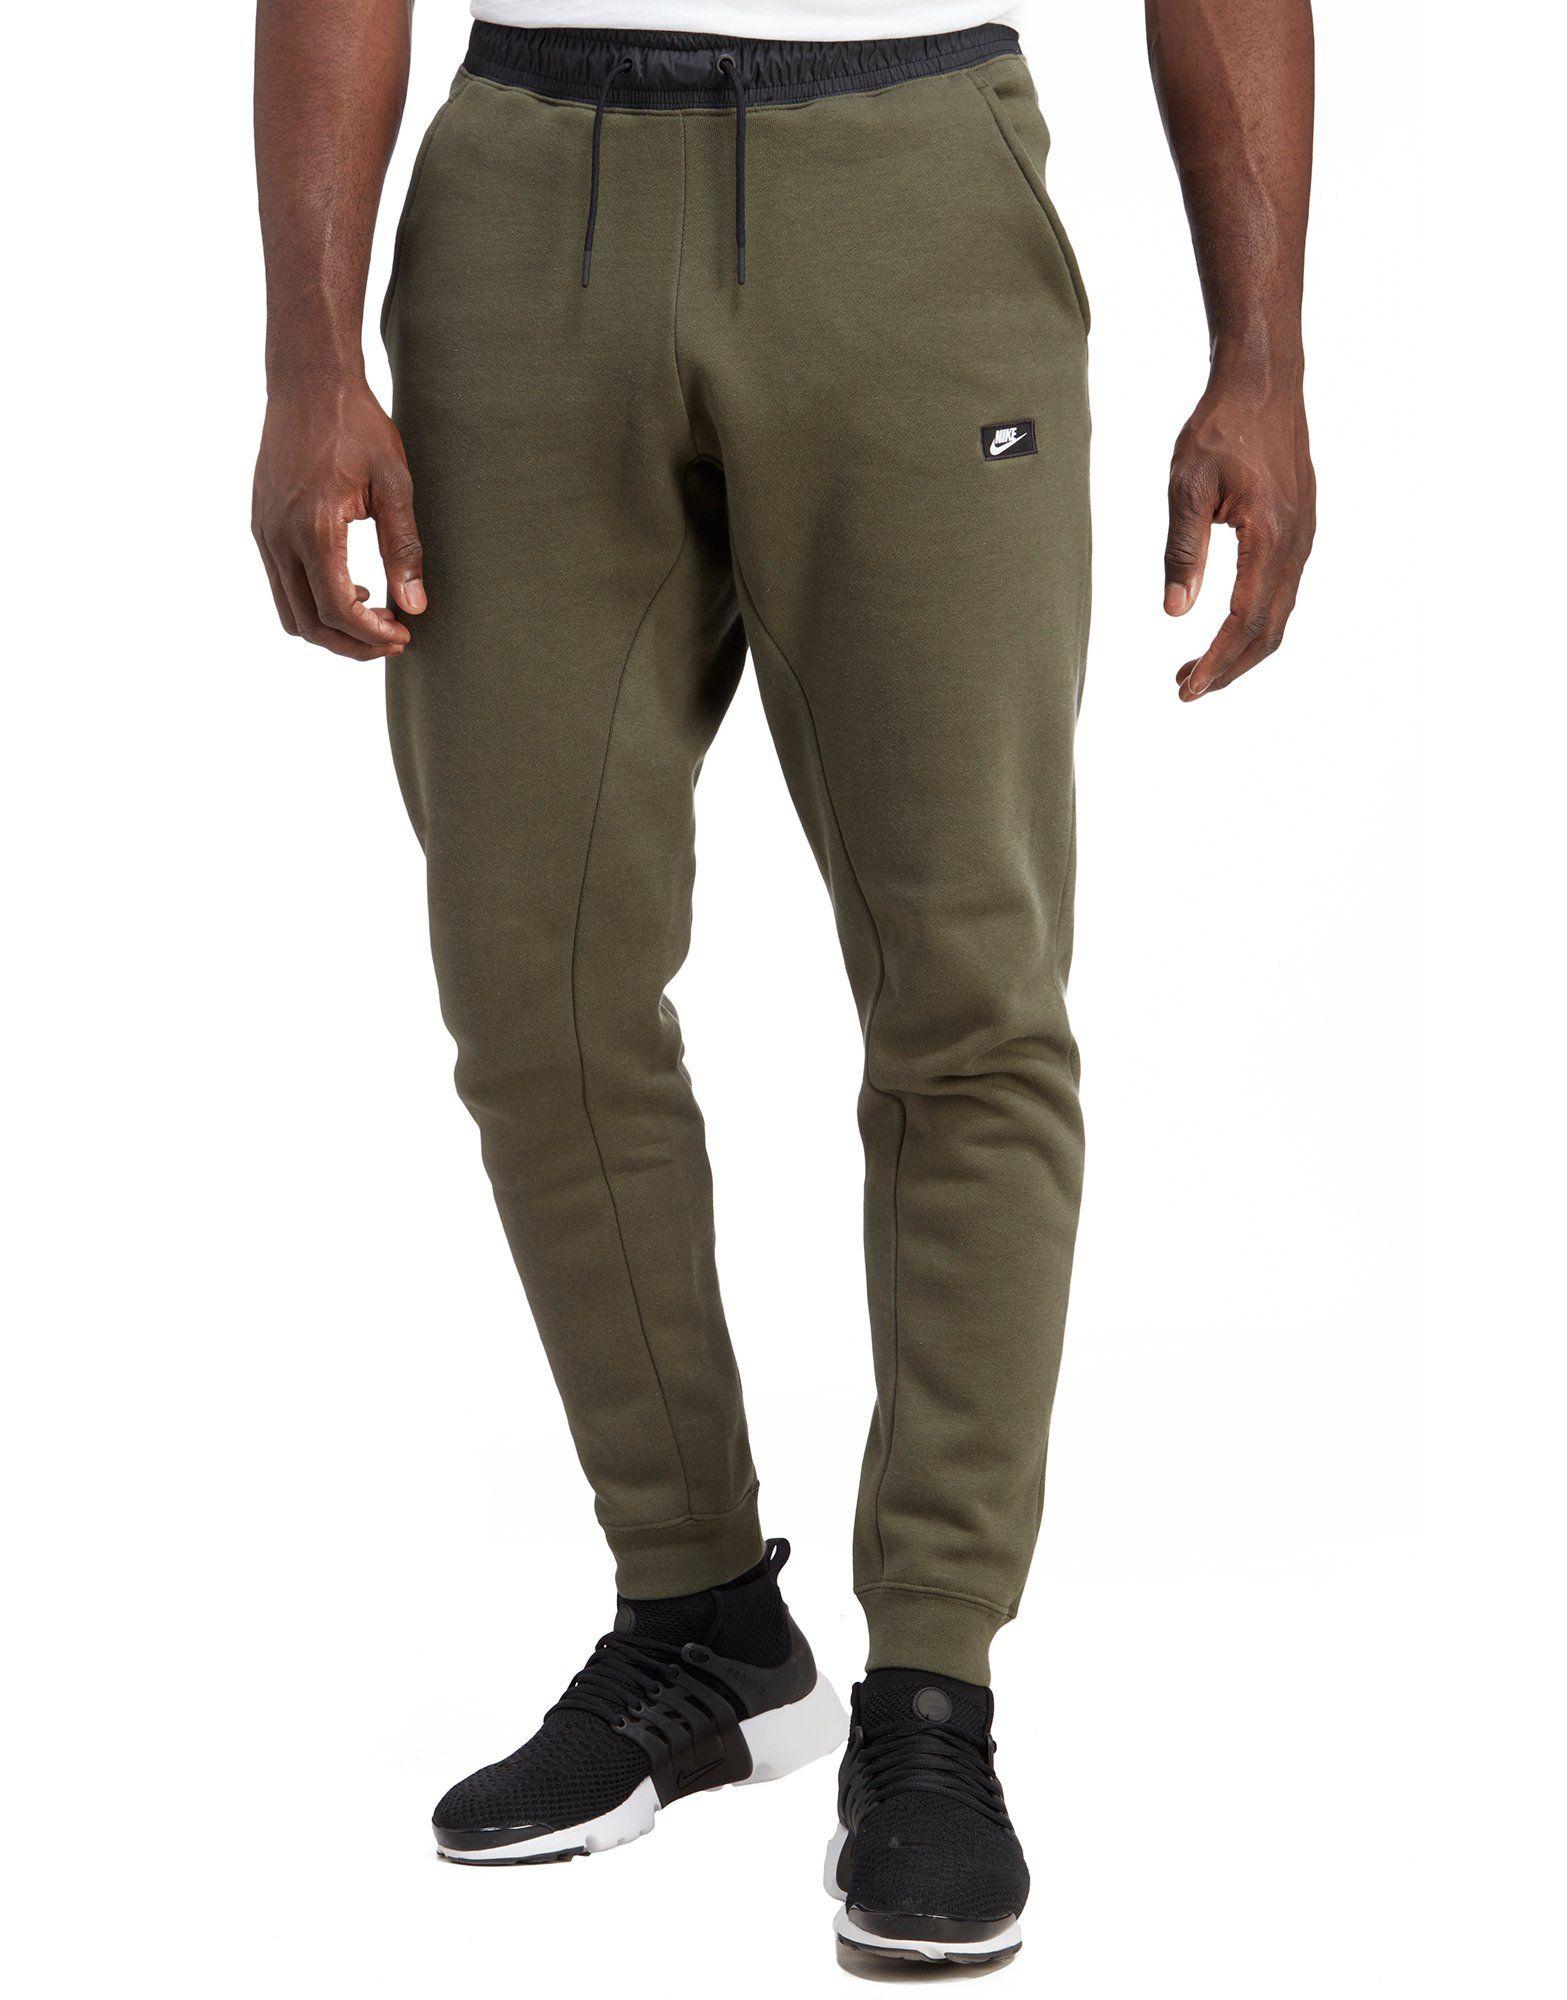 Popular Nike Legend 2.0 Slim Poly Pants Womenu0026#39;s Long Sports Trousers Black/cool Grey Black Black / Cool ...